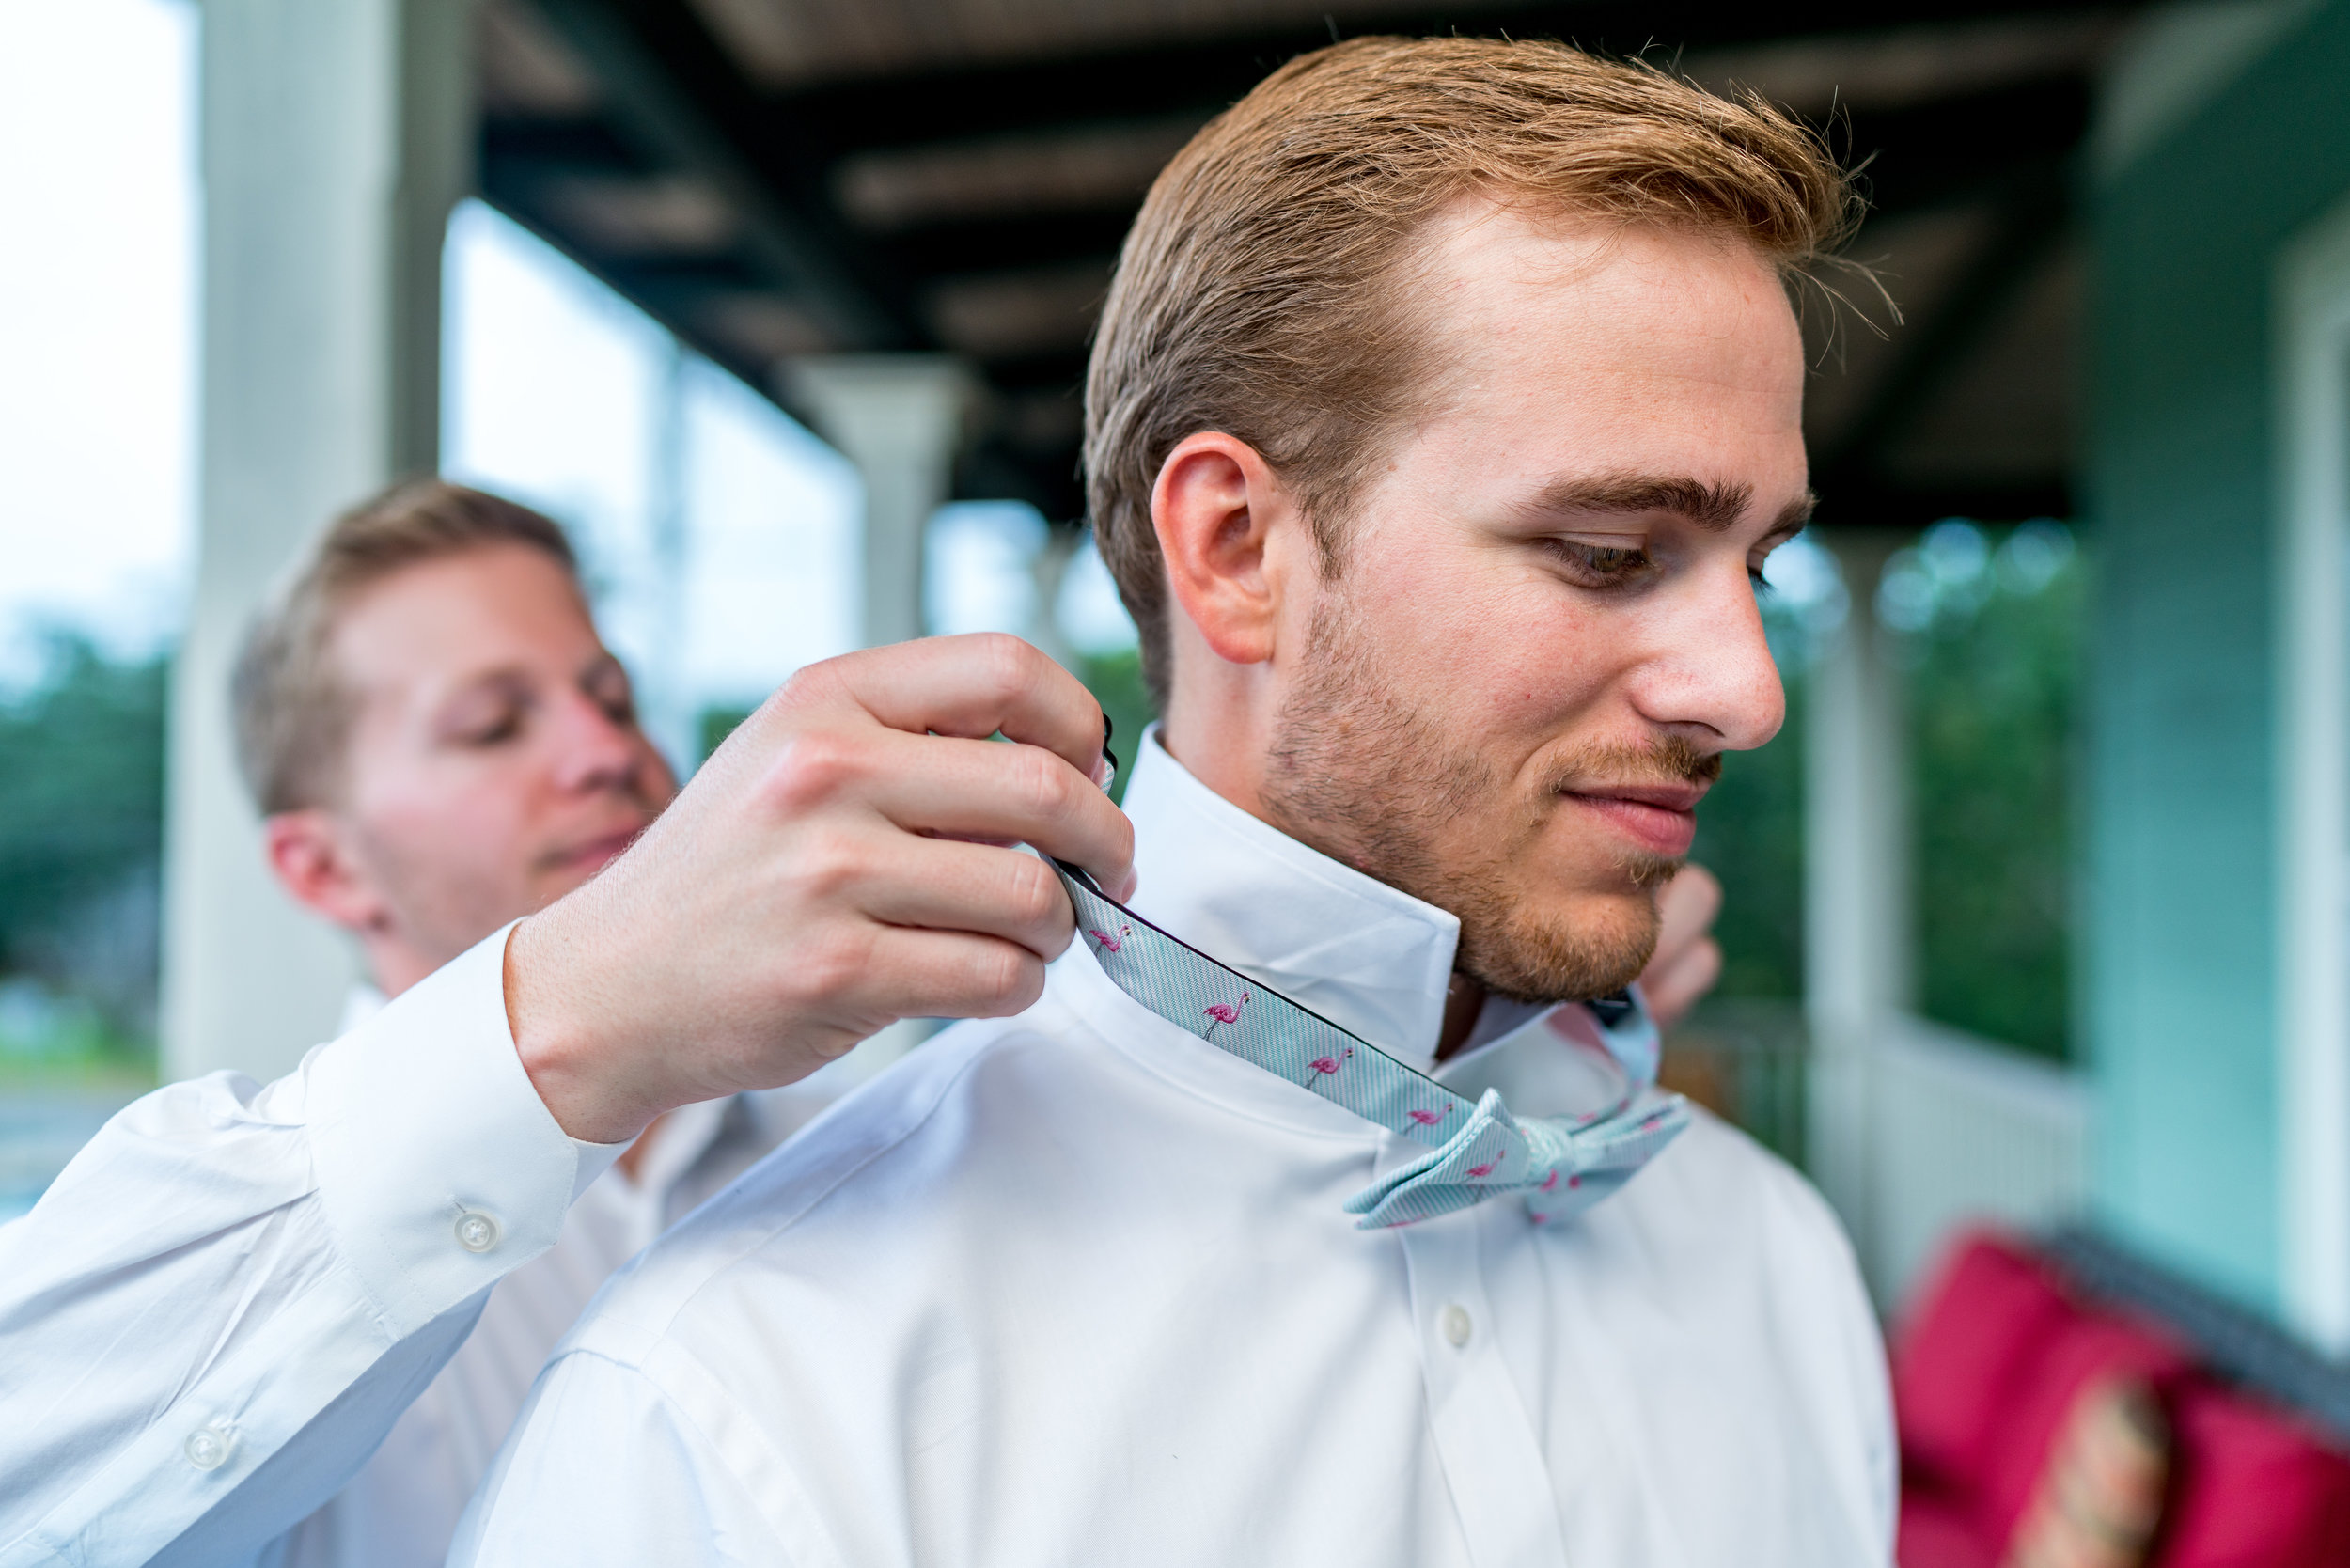 groom-bowtie-wedding-photographer.jpg